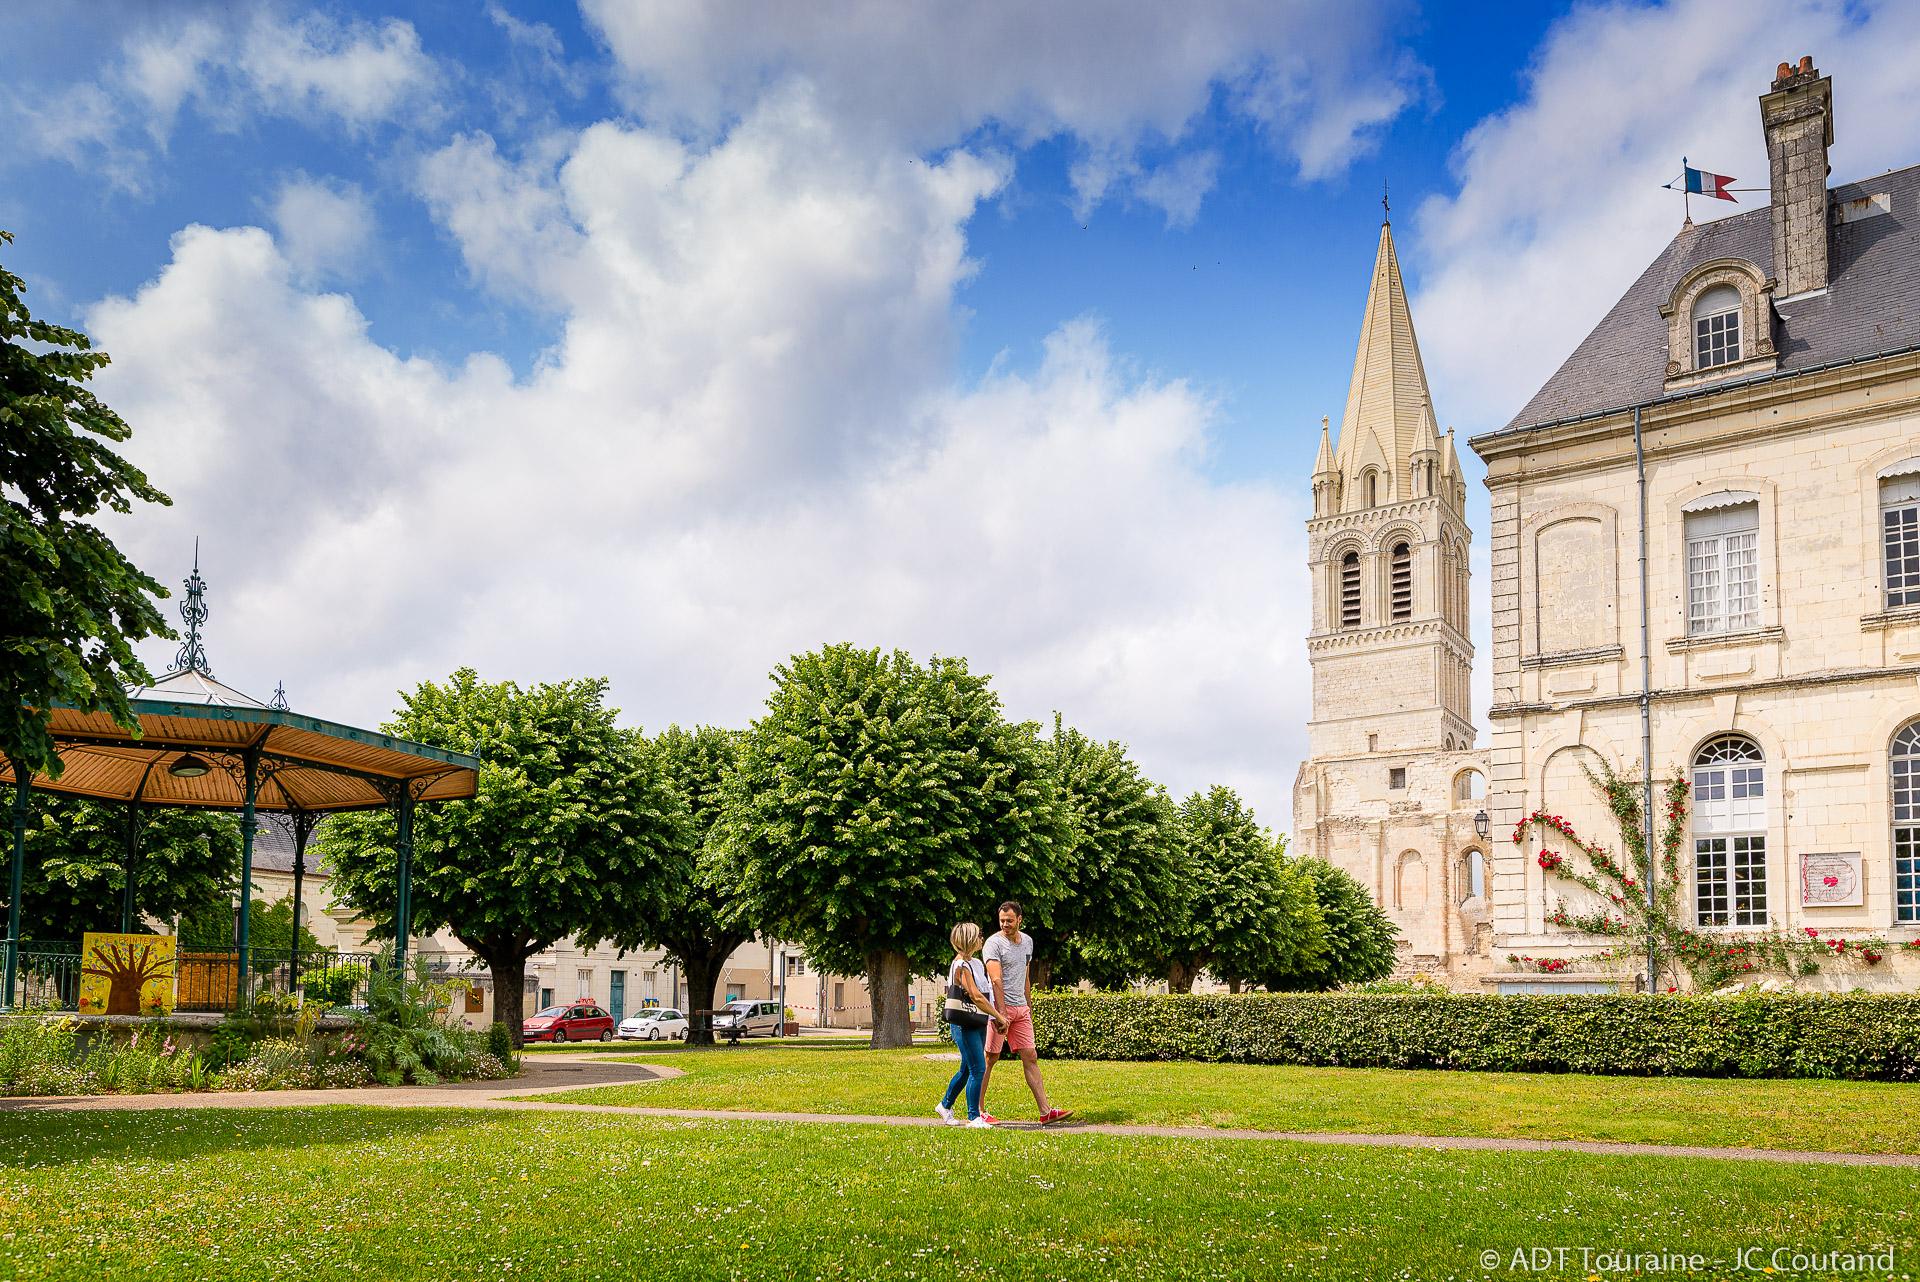 Saint-Pierre-Saint-Paul church spire and the town hall